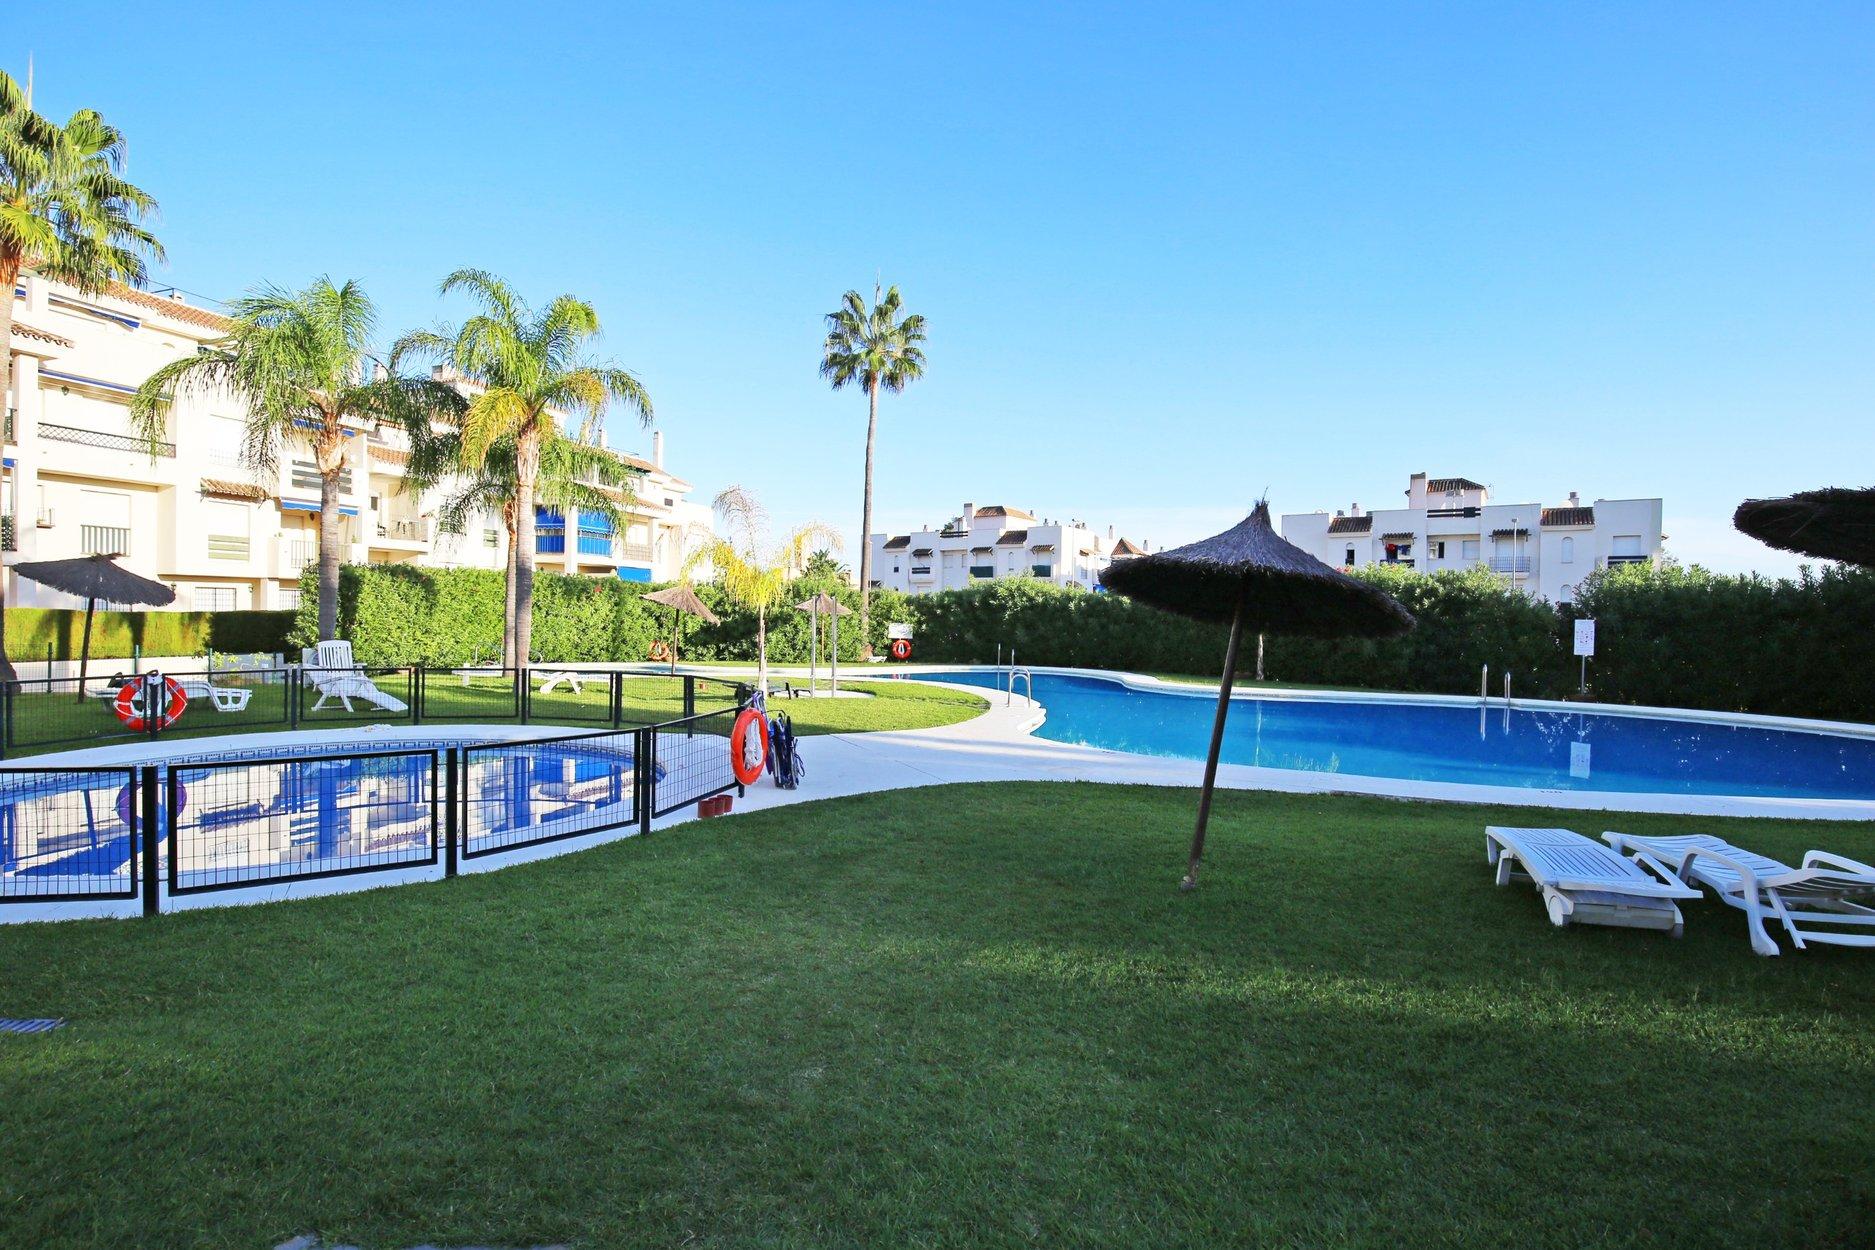 Apartment for sale in Marbella, Lorcrimar